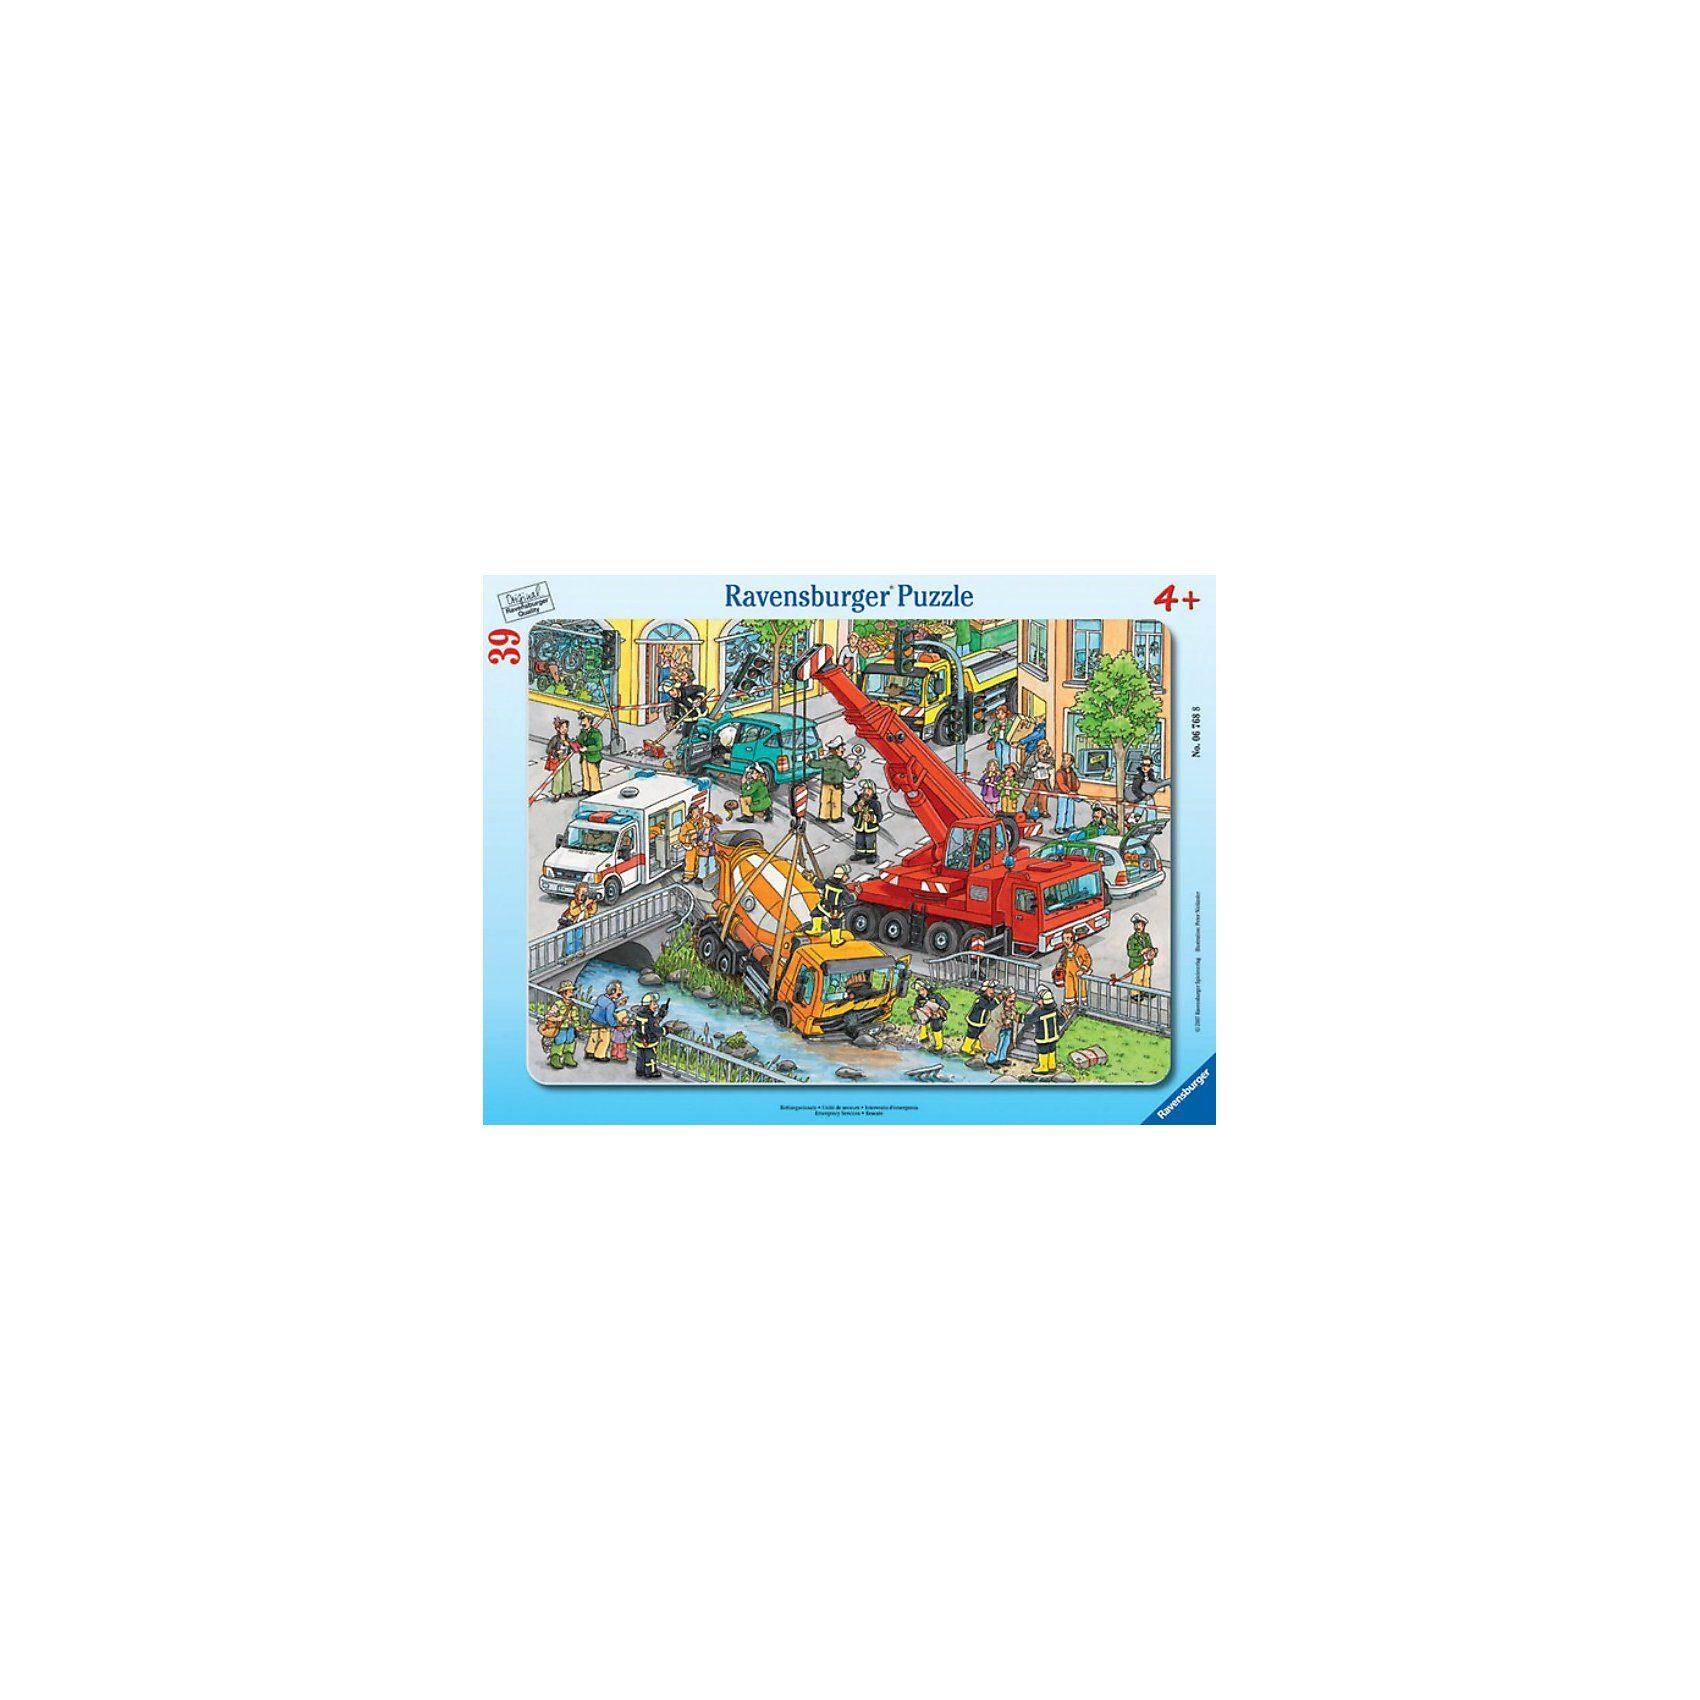 Ravensburger Rahmenpuzzle-39 Teile- Rettungseinsatz